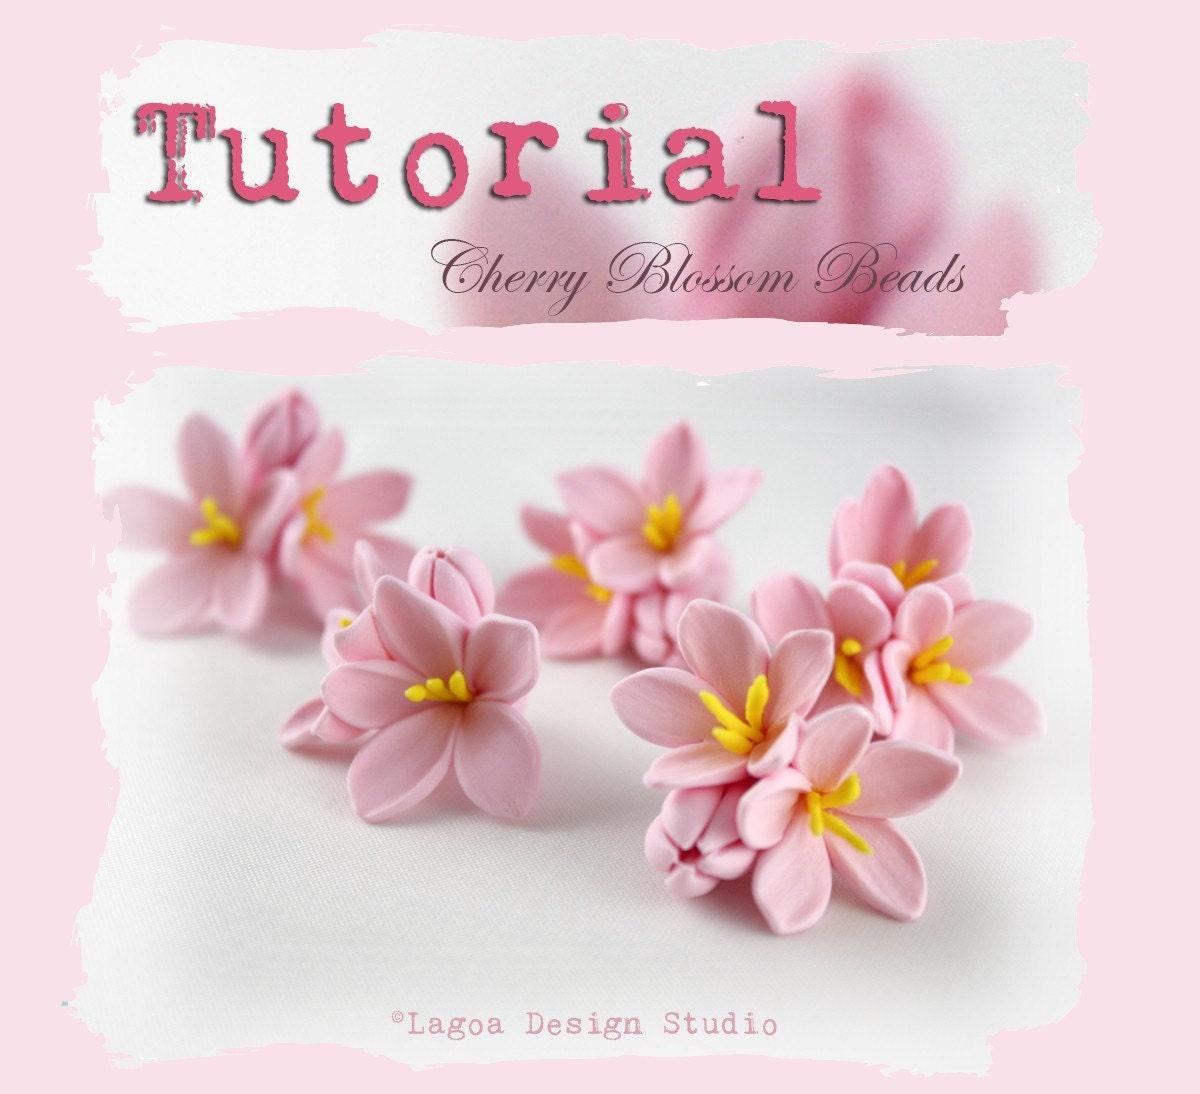 Clay Flowers Tutorials: TUTORIAL // Hand Sculpted Polymer Clay Sakura Cherry Blossom